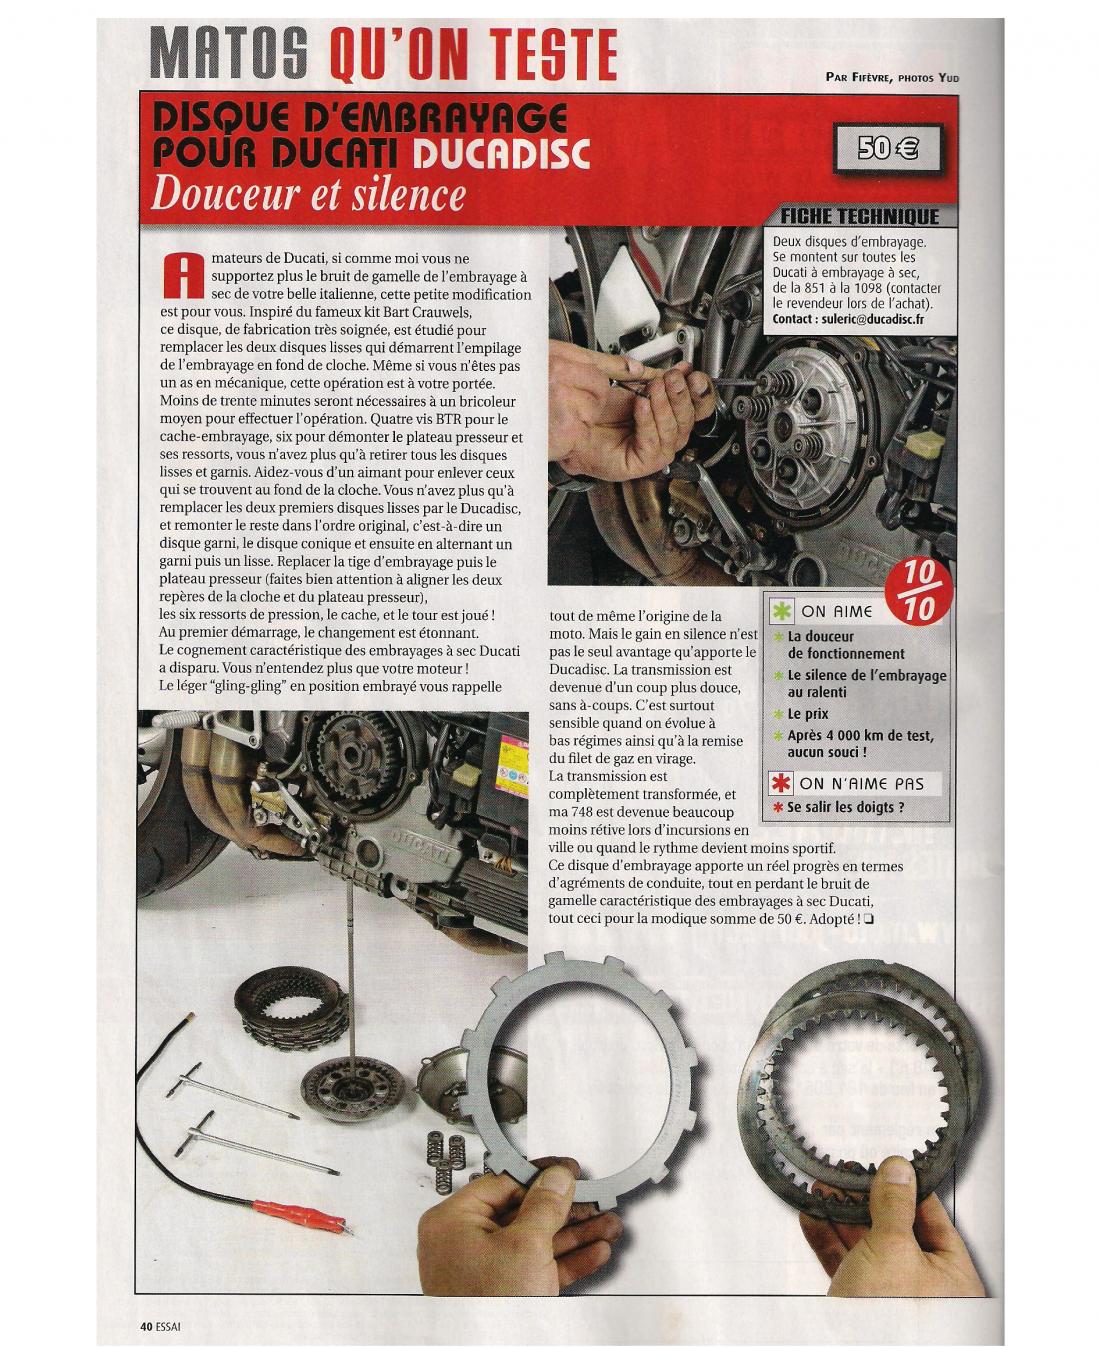 Moto journal 1937 du 20 janvier 2011 page 40